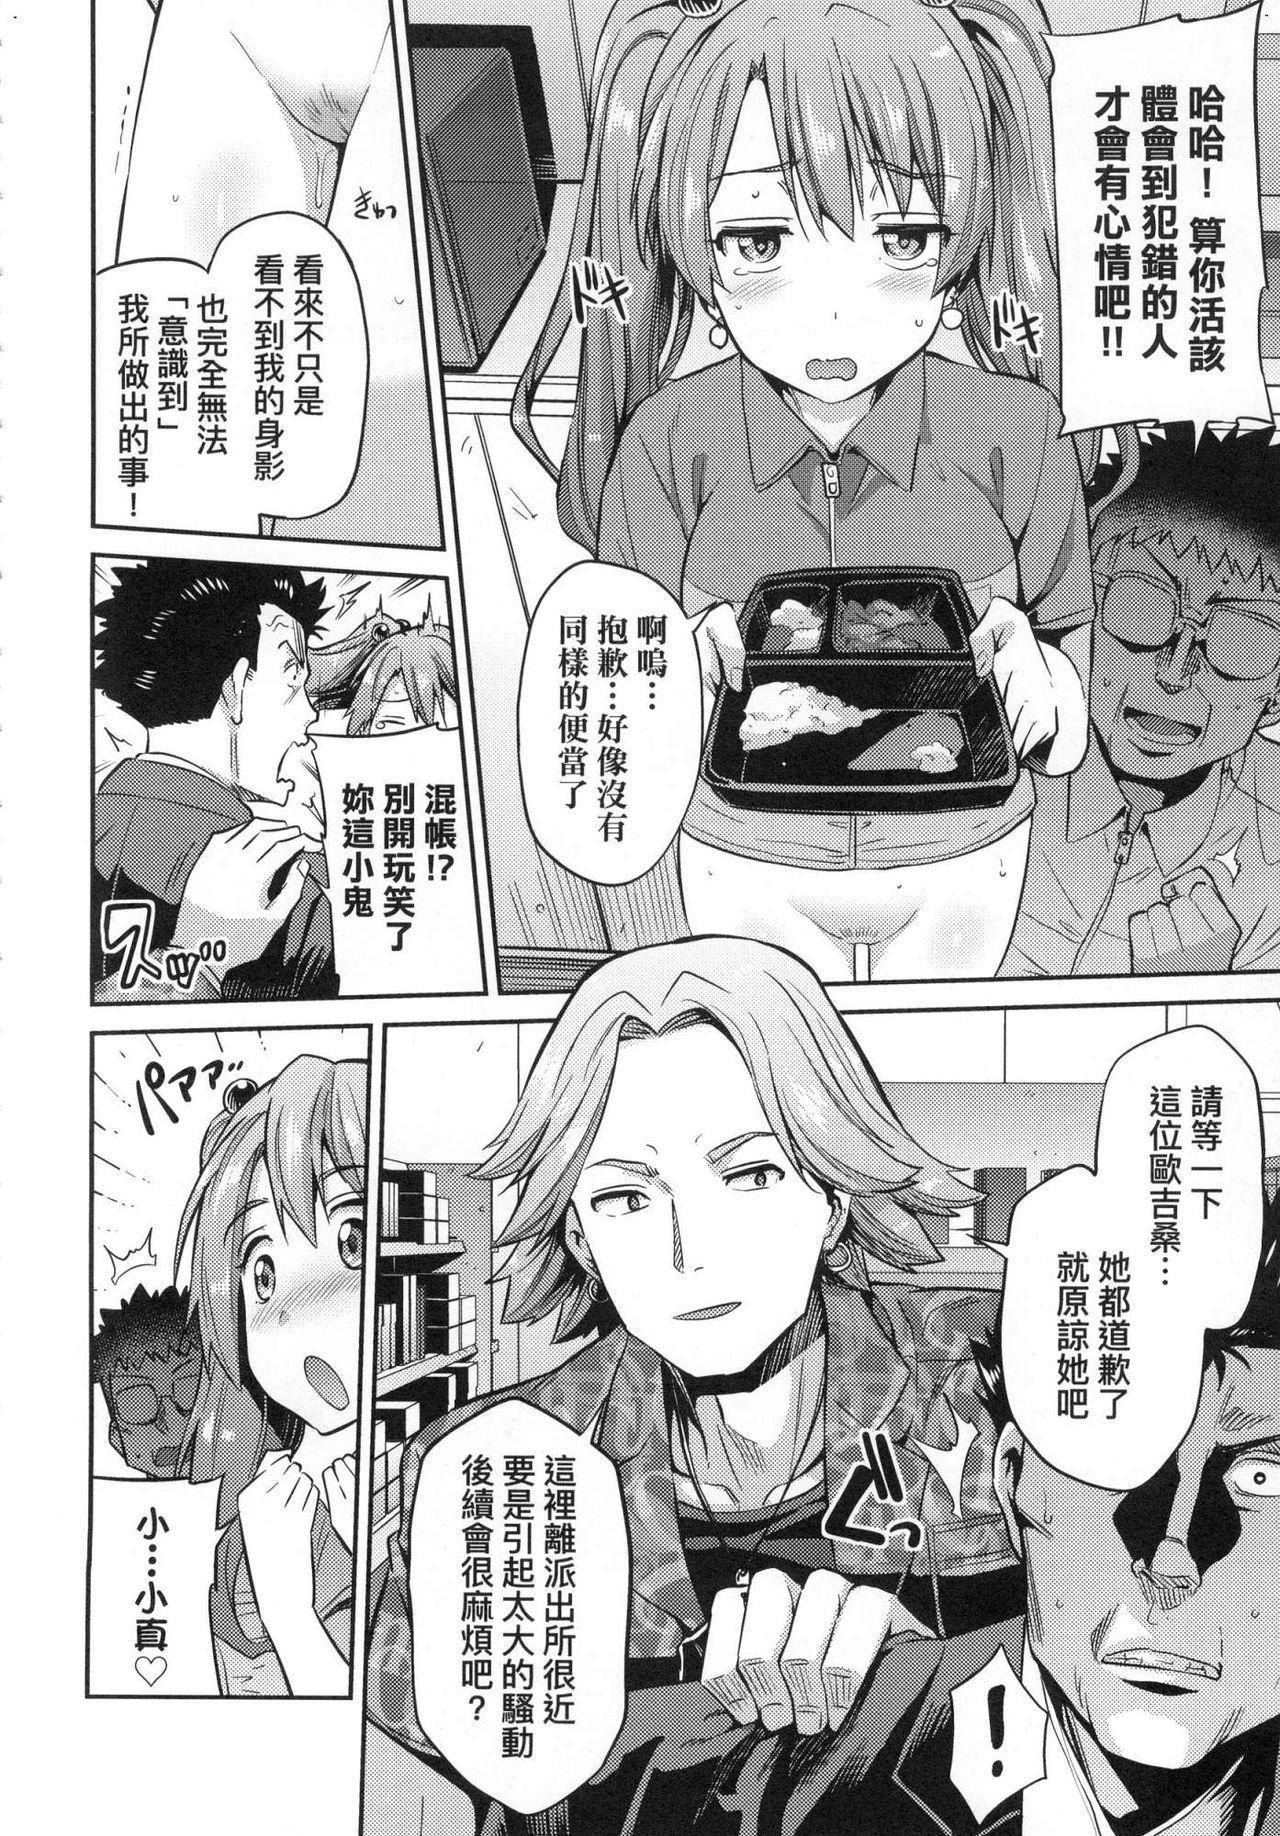 Kyousei Tanetsuke Express - Forced Seeding Express 55